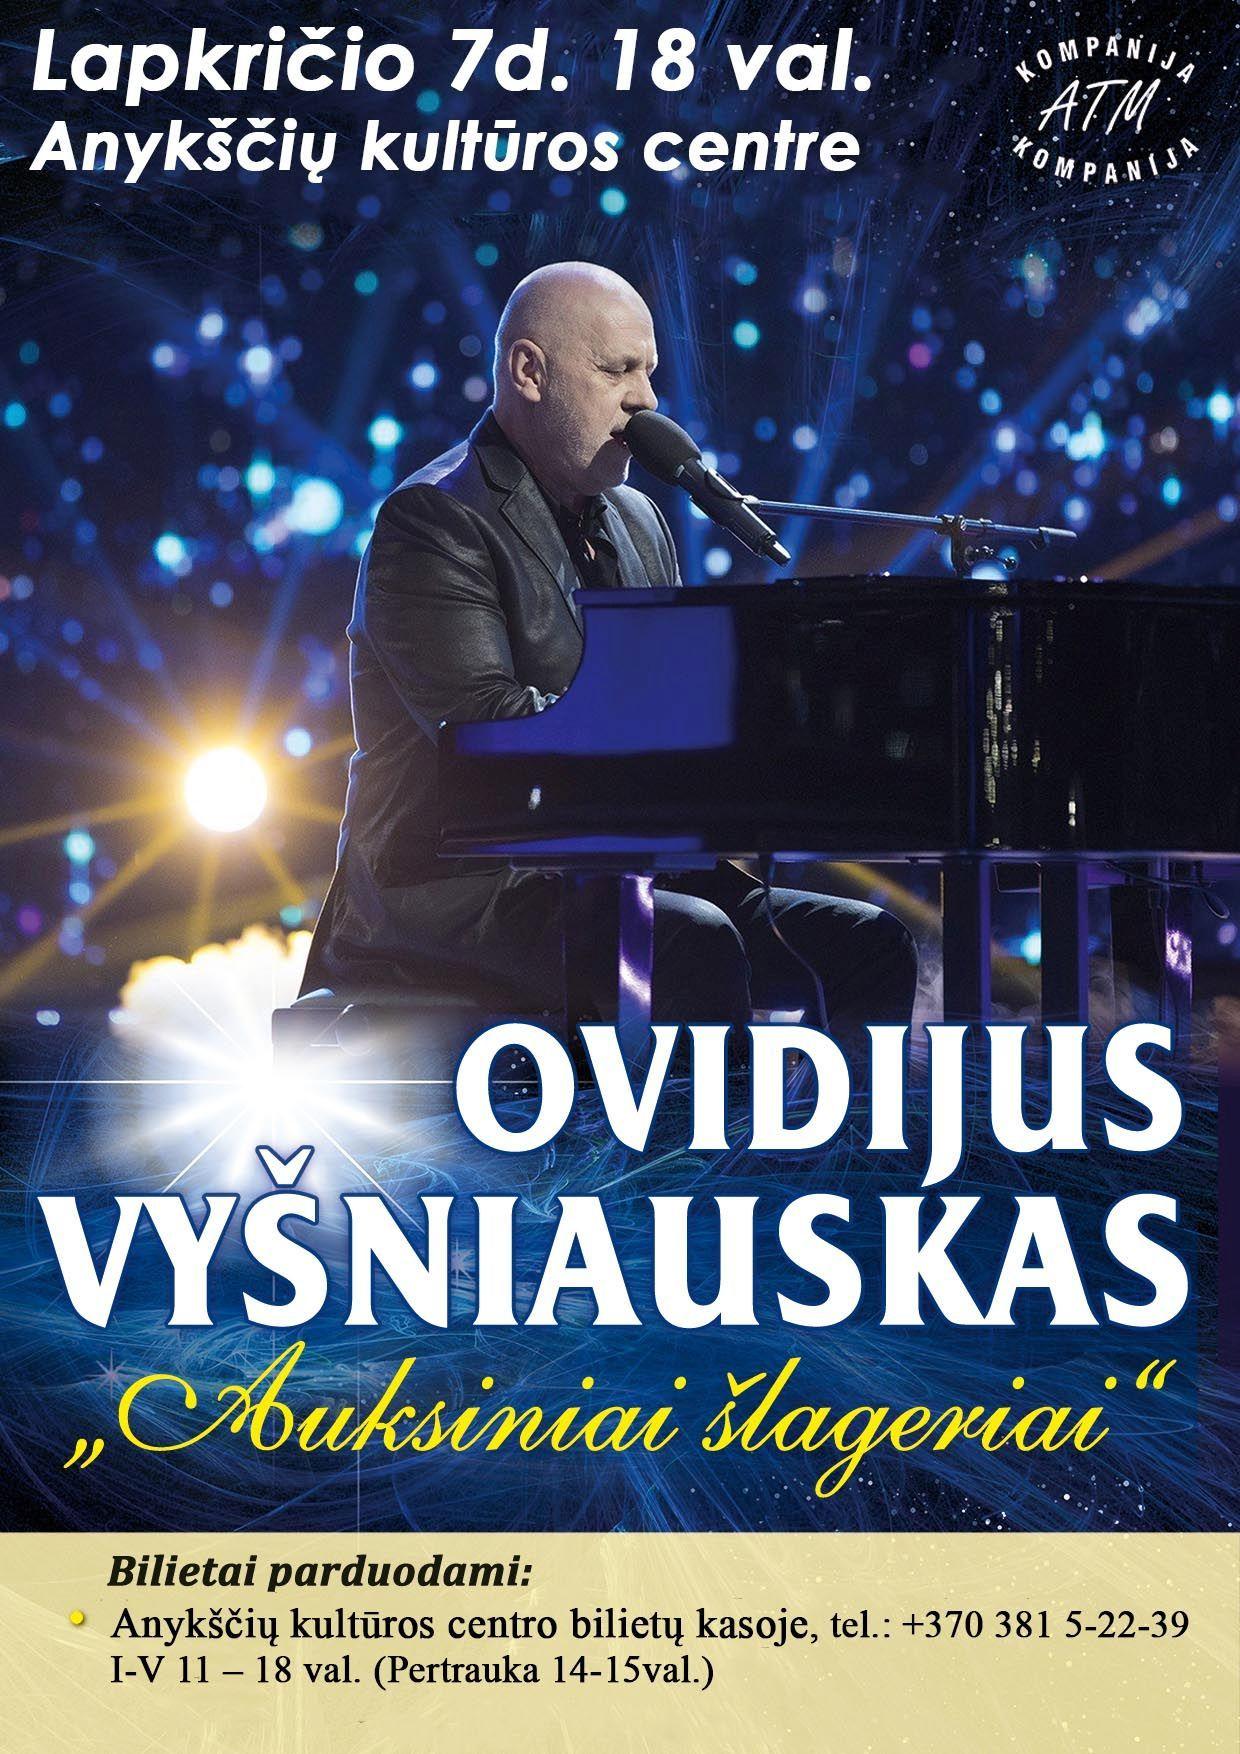 Ovidijaus Vyšniausko koncertas